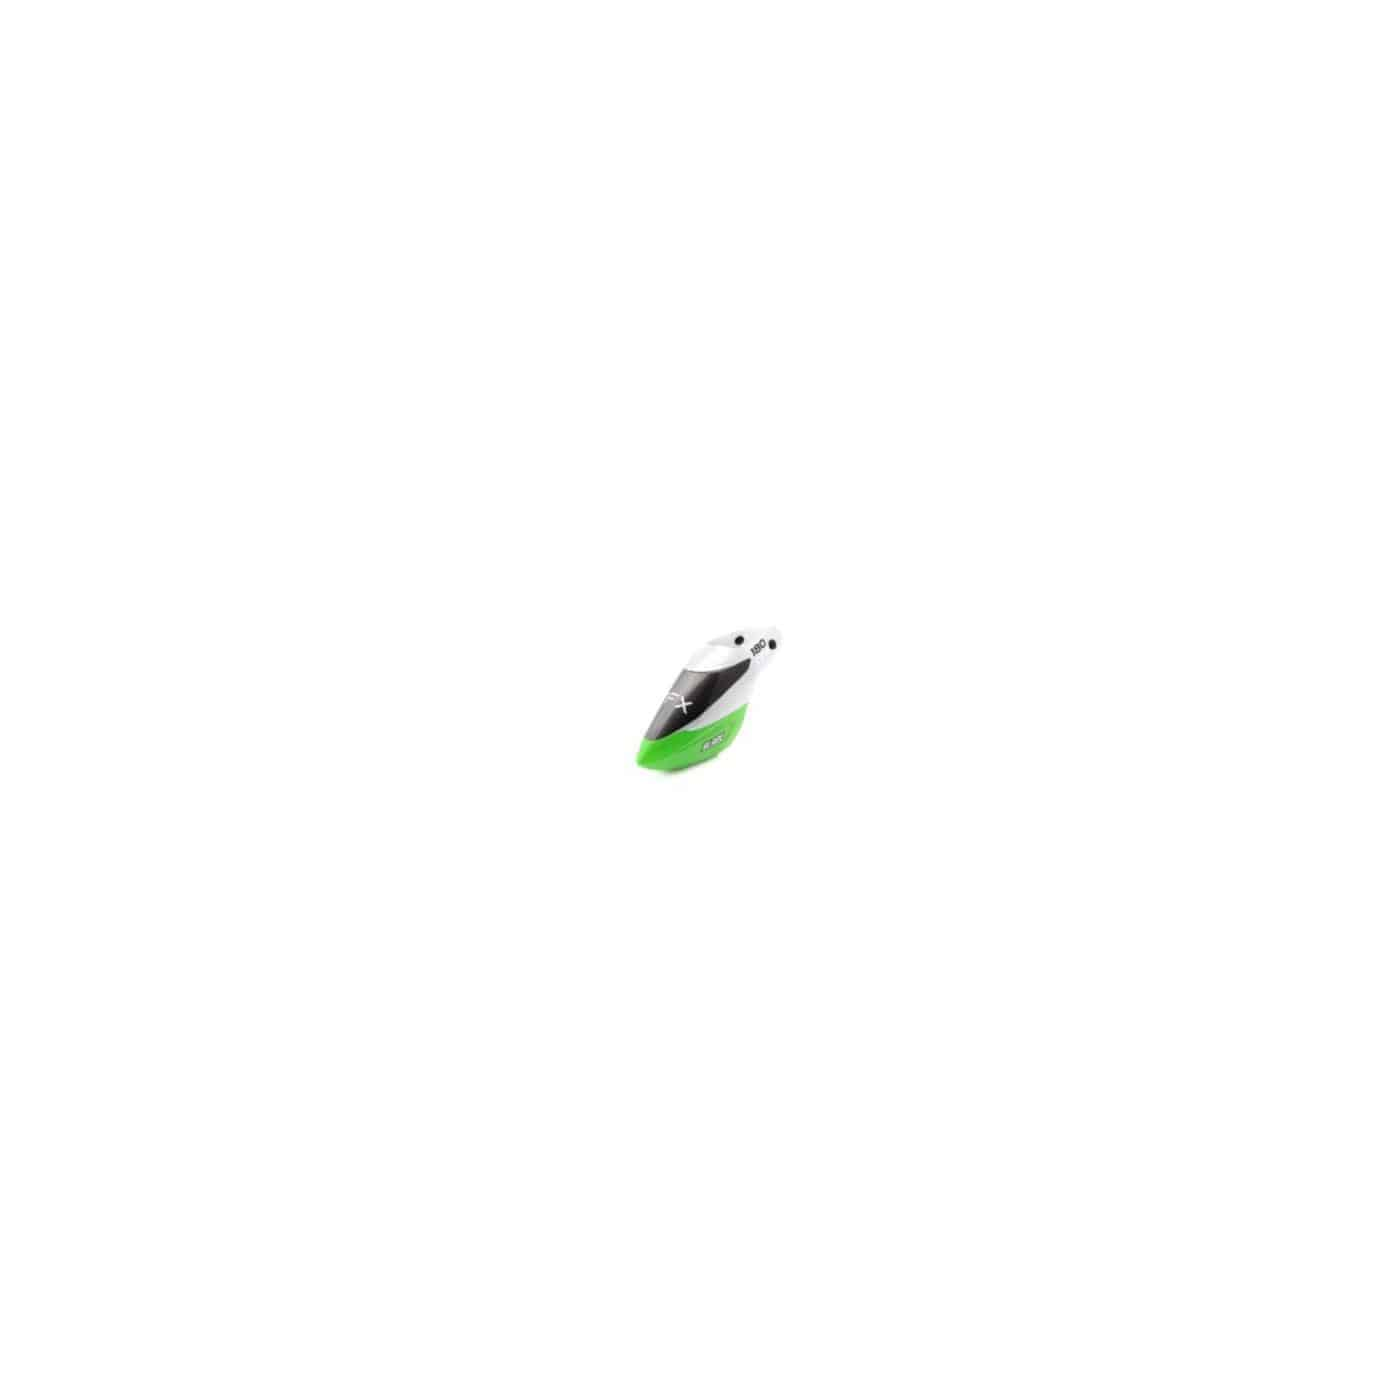 (BLH3409) - Stock Canopy: 180 CFX